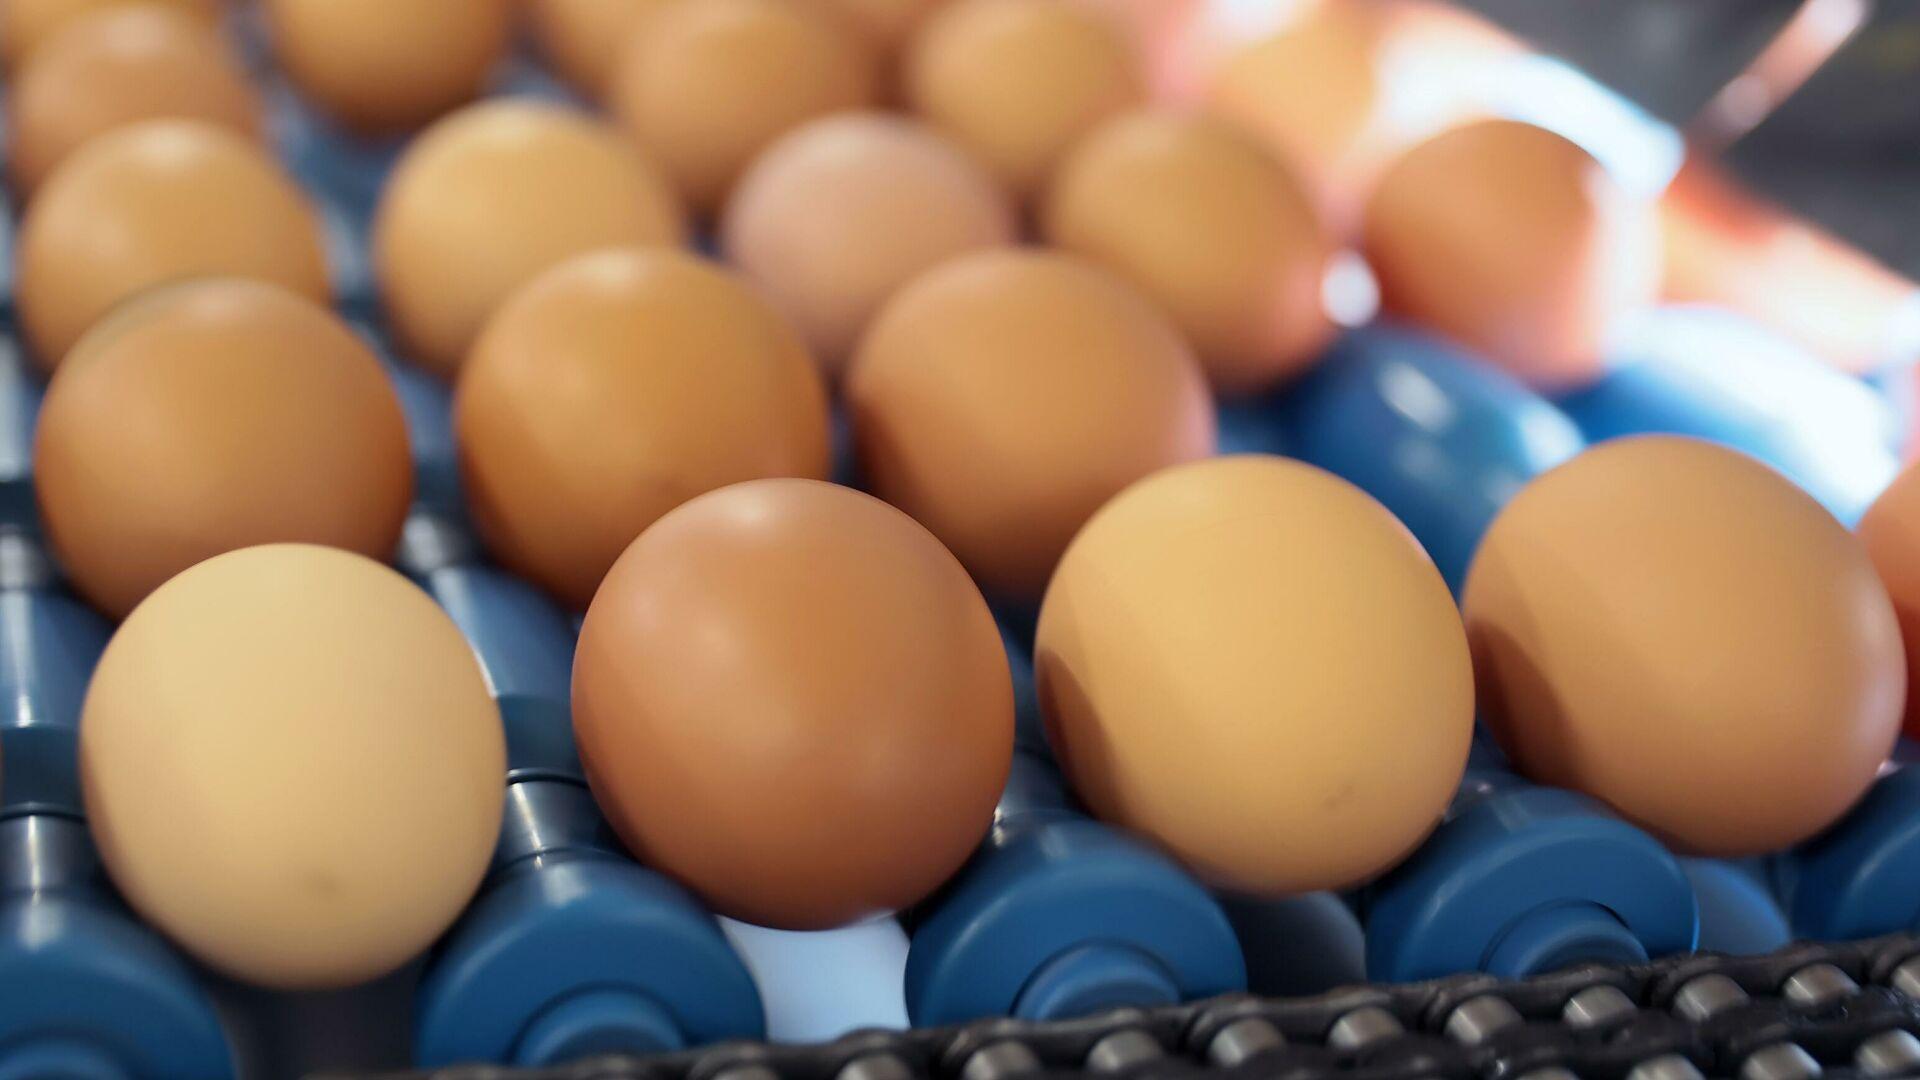 Россиянам грозит дефицит яиц? Экономист оценил ситуацию